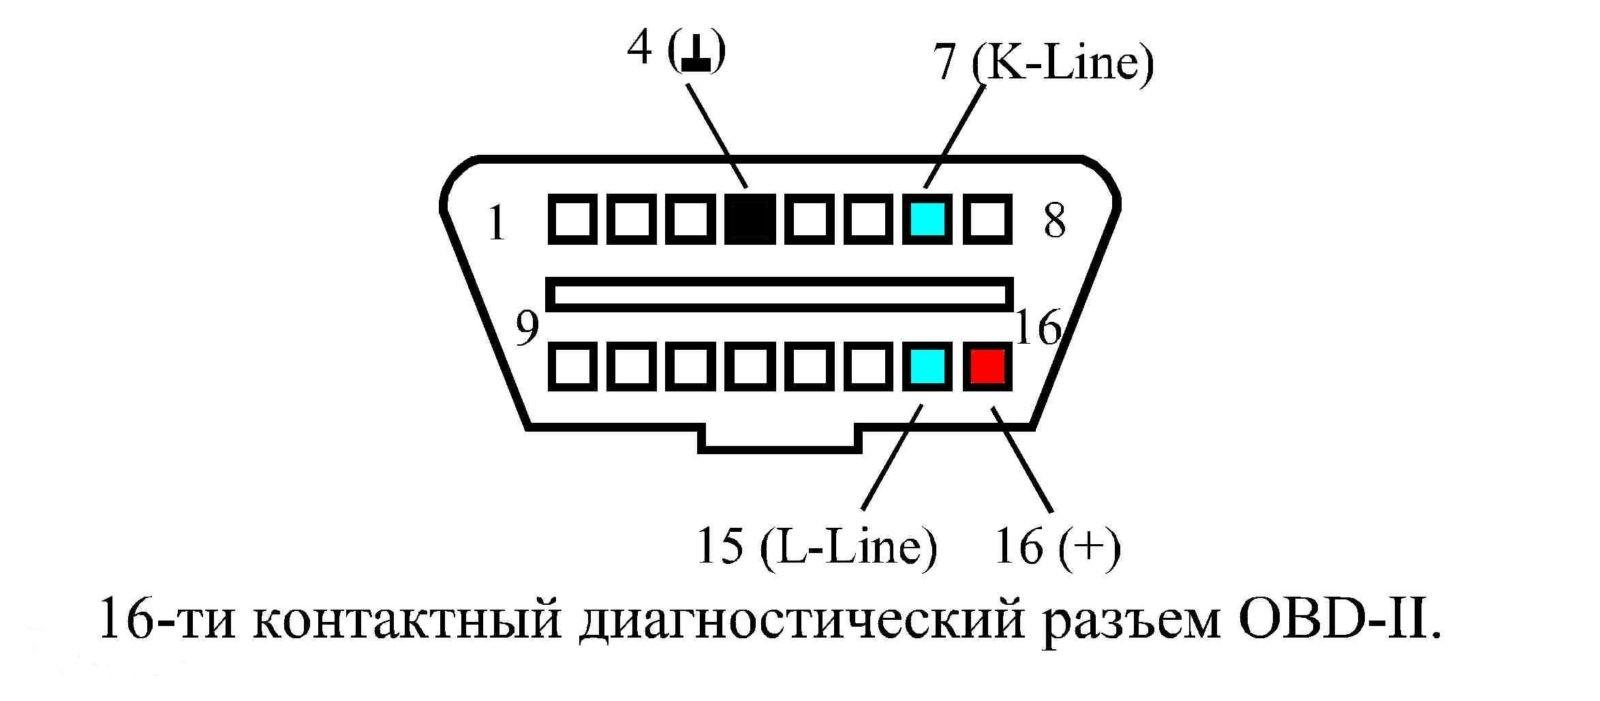 Версии протокола Consult